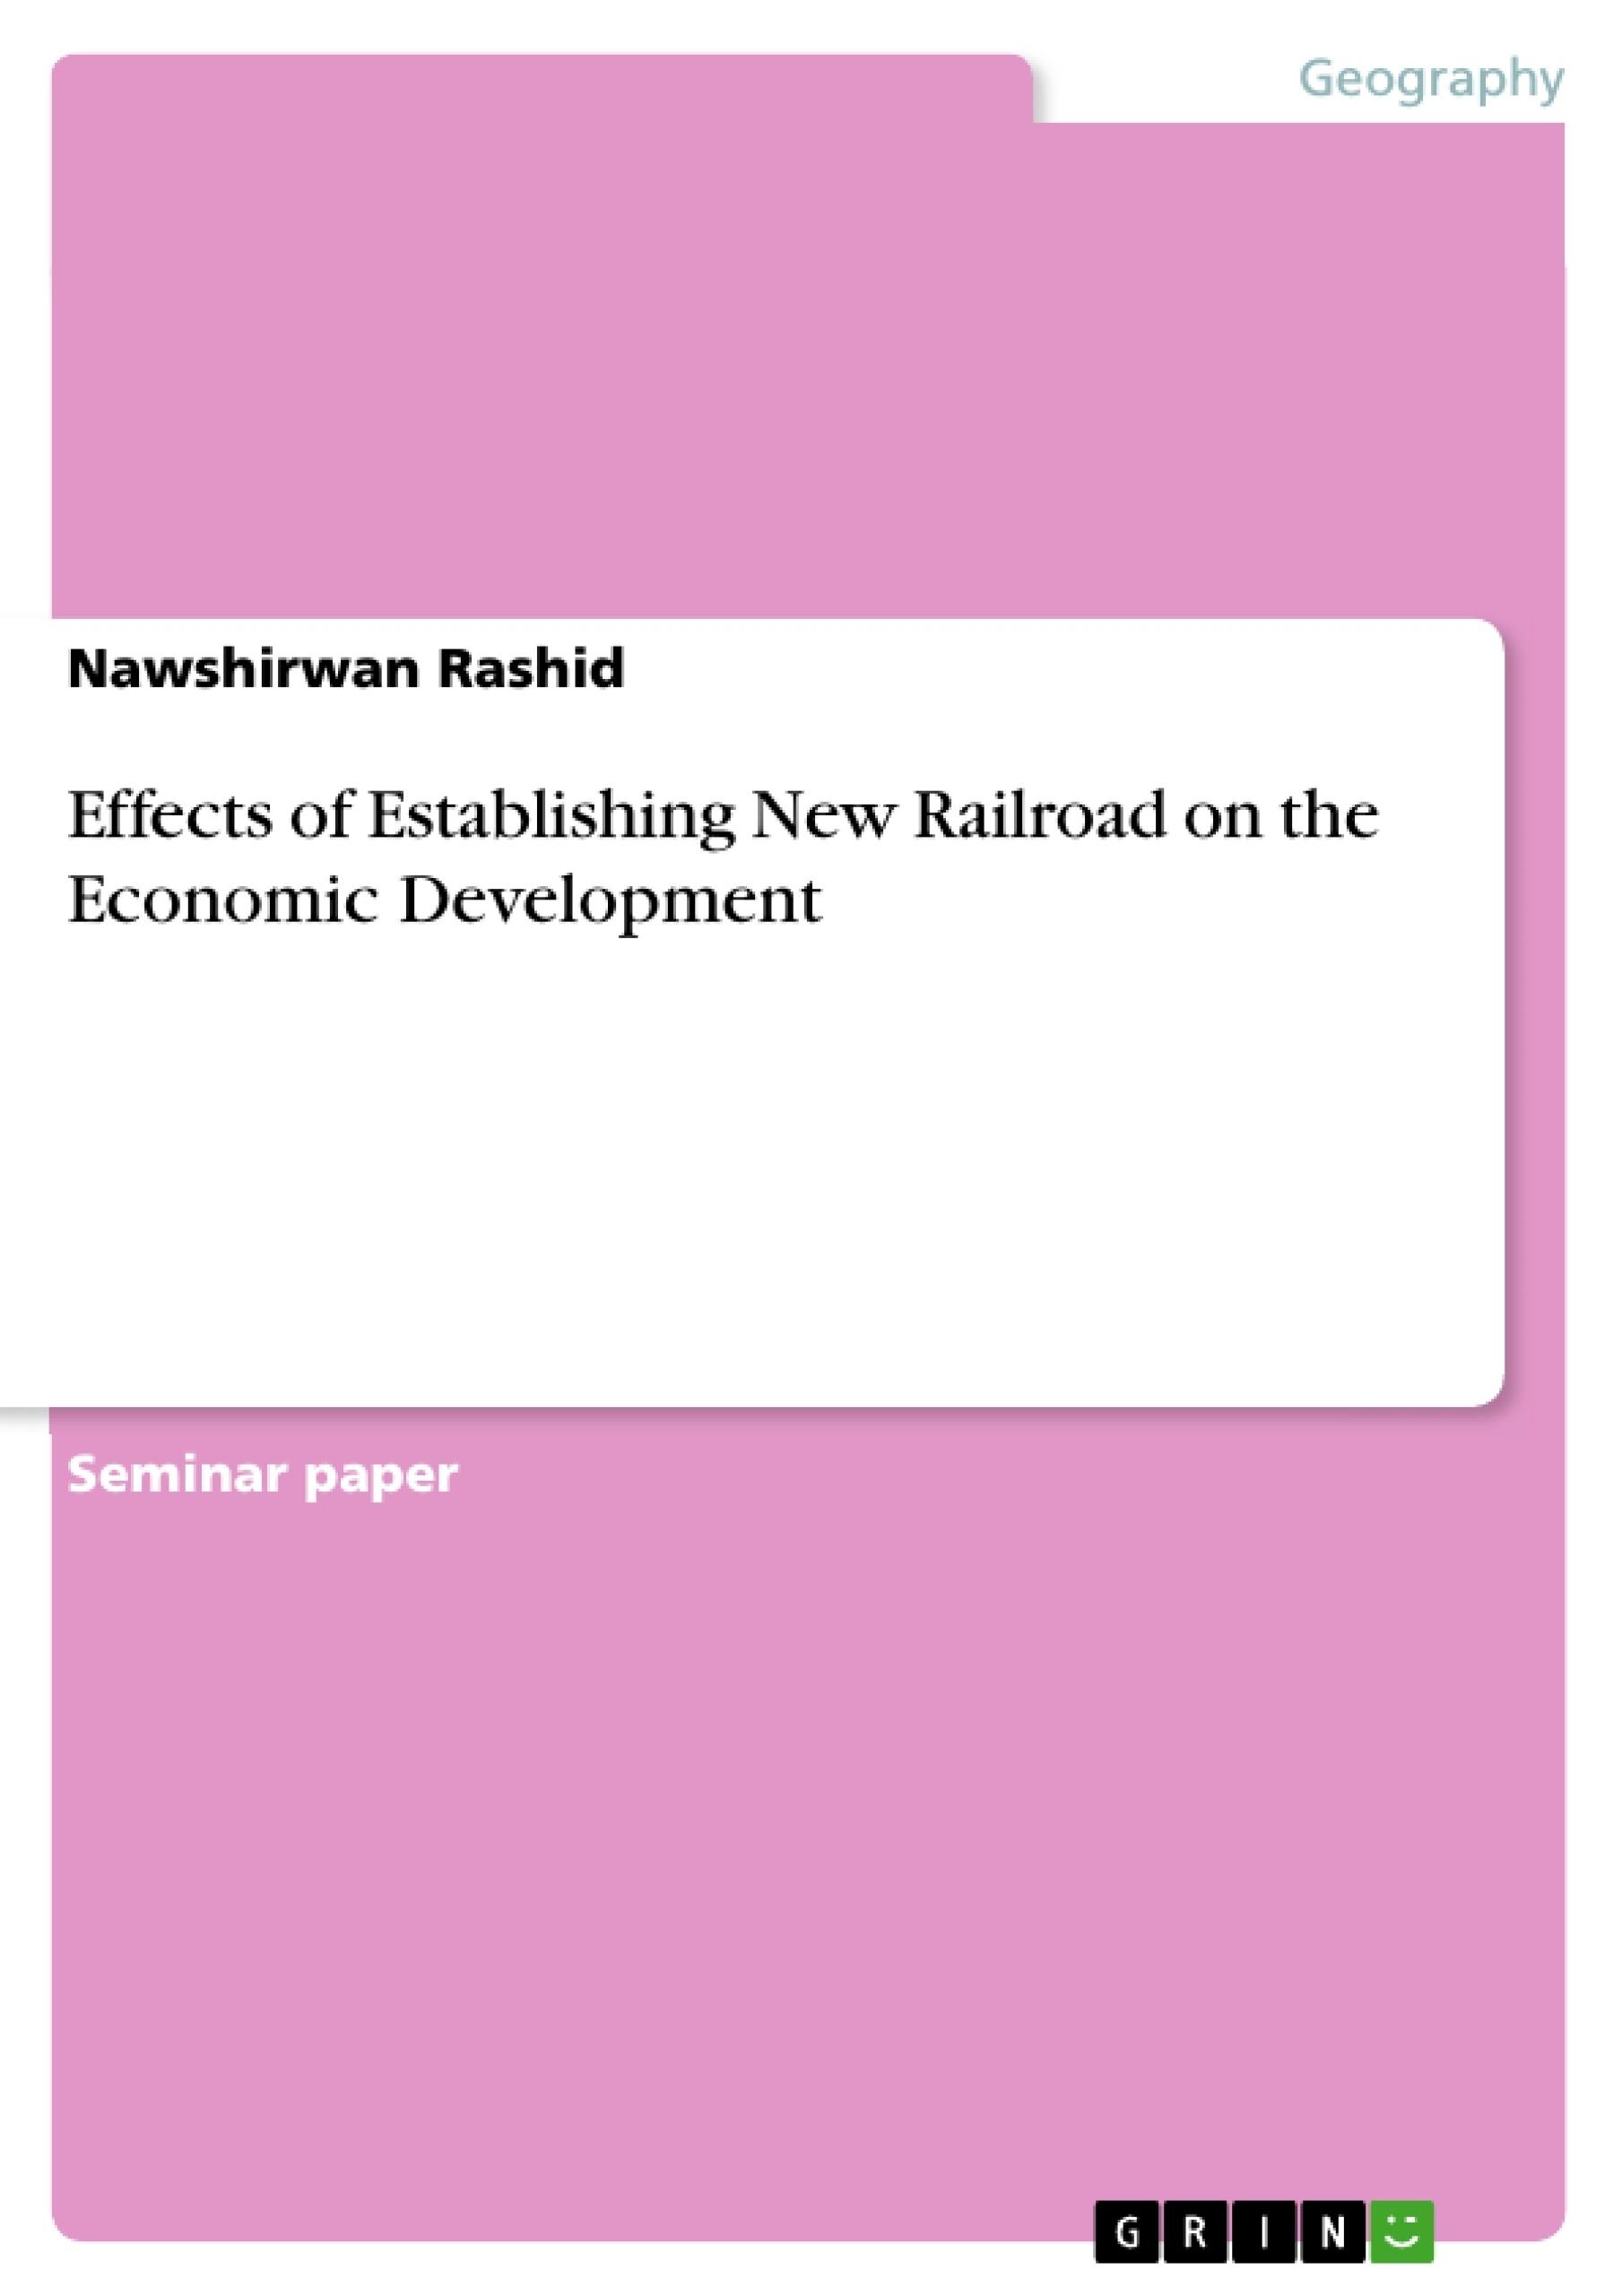 Title: Effects of Establishing New Railroad on the Economic Development